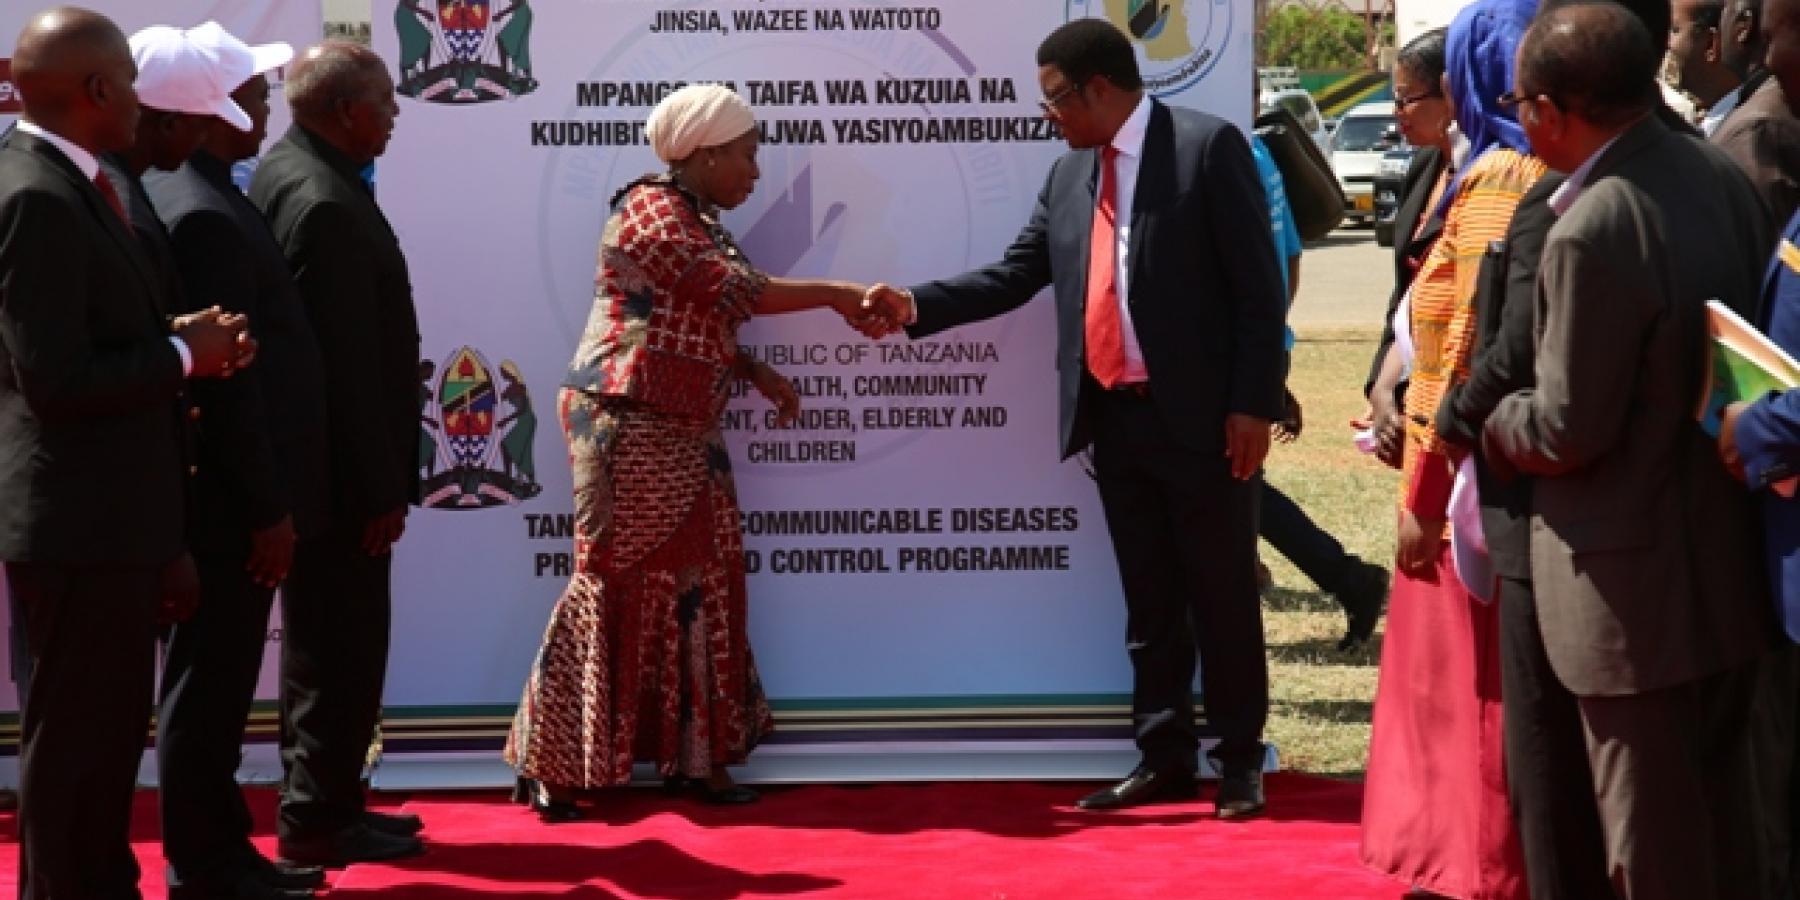 Tanzania Prime Minister Kassim Majaliwa congratulating the Minister of Health, Hon Ummy Mwalimu